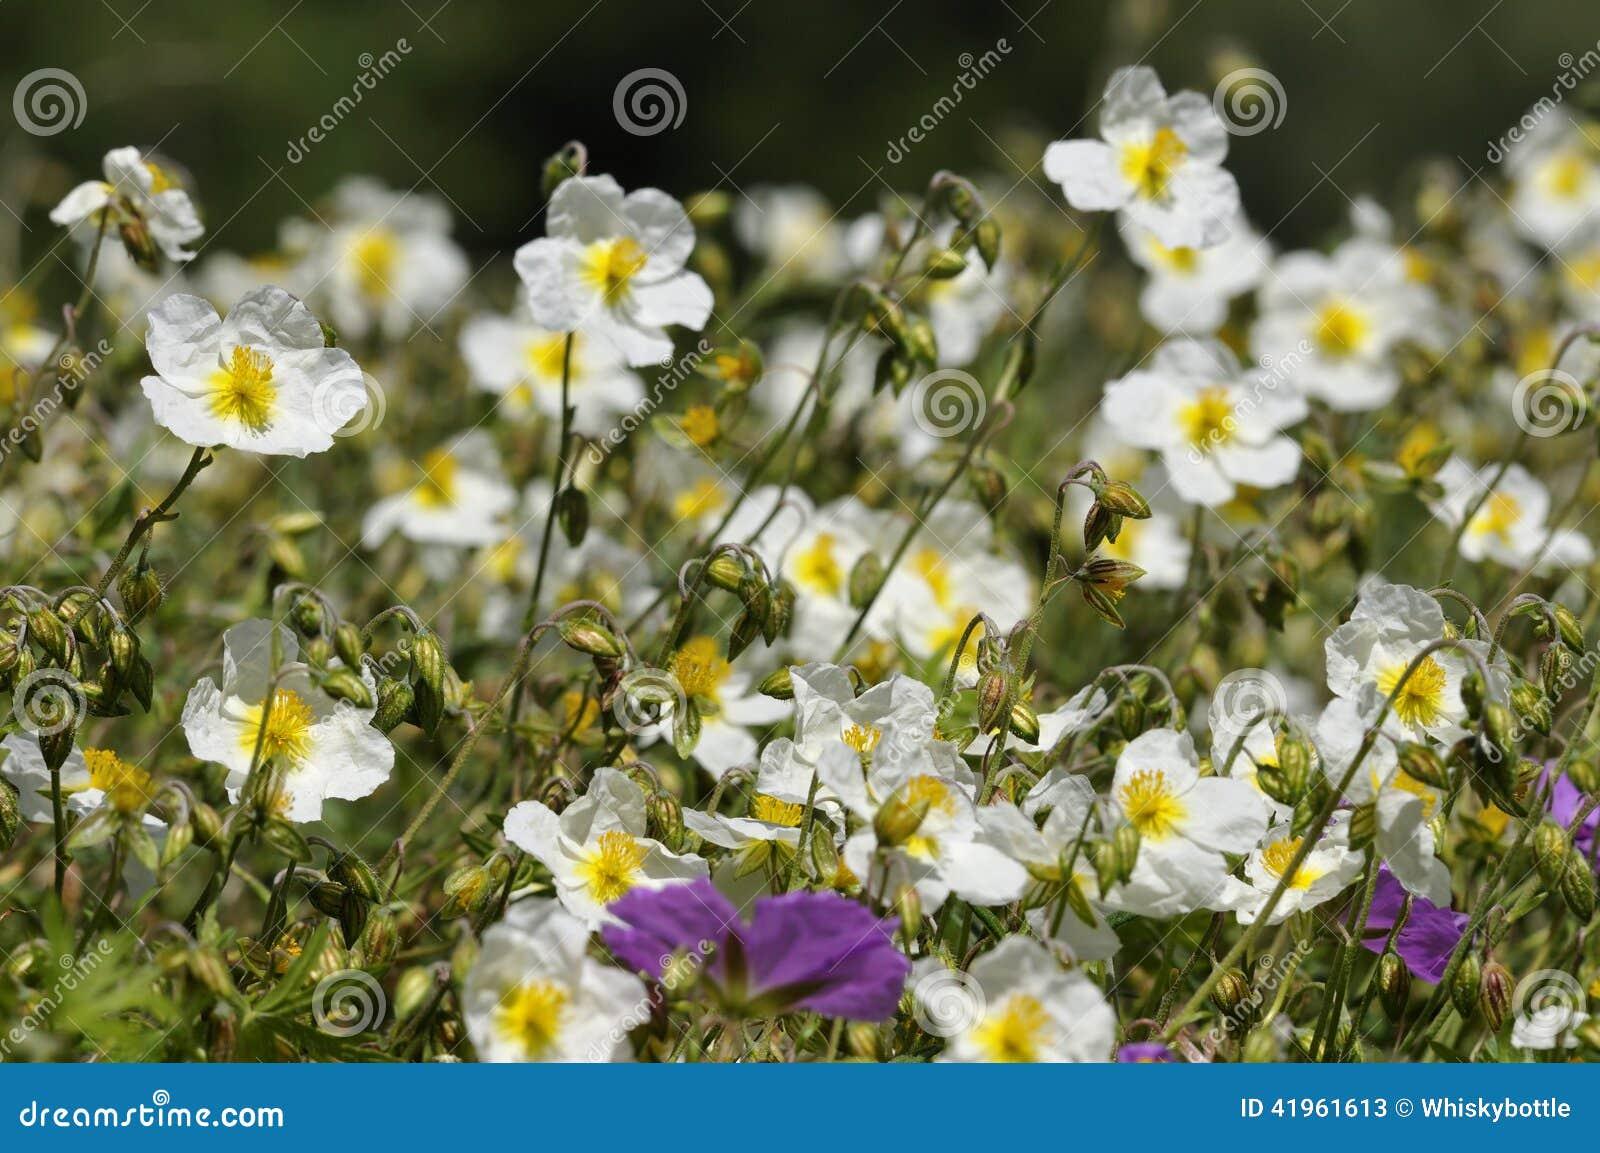 White Rock Rose Stock Image Image Of Helianthemum Nature 41961613